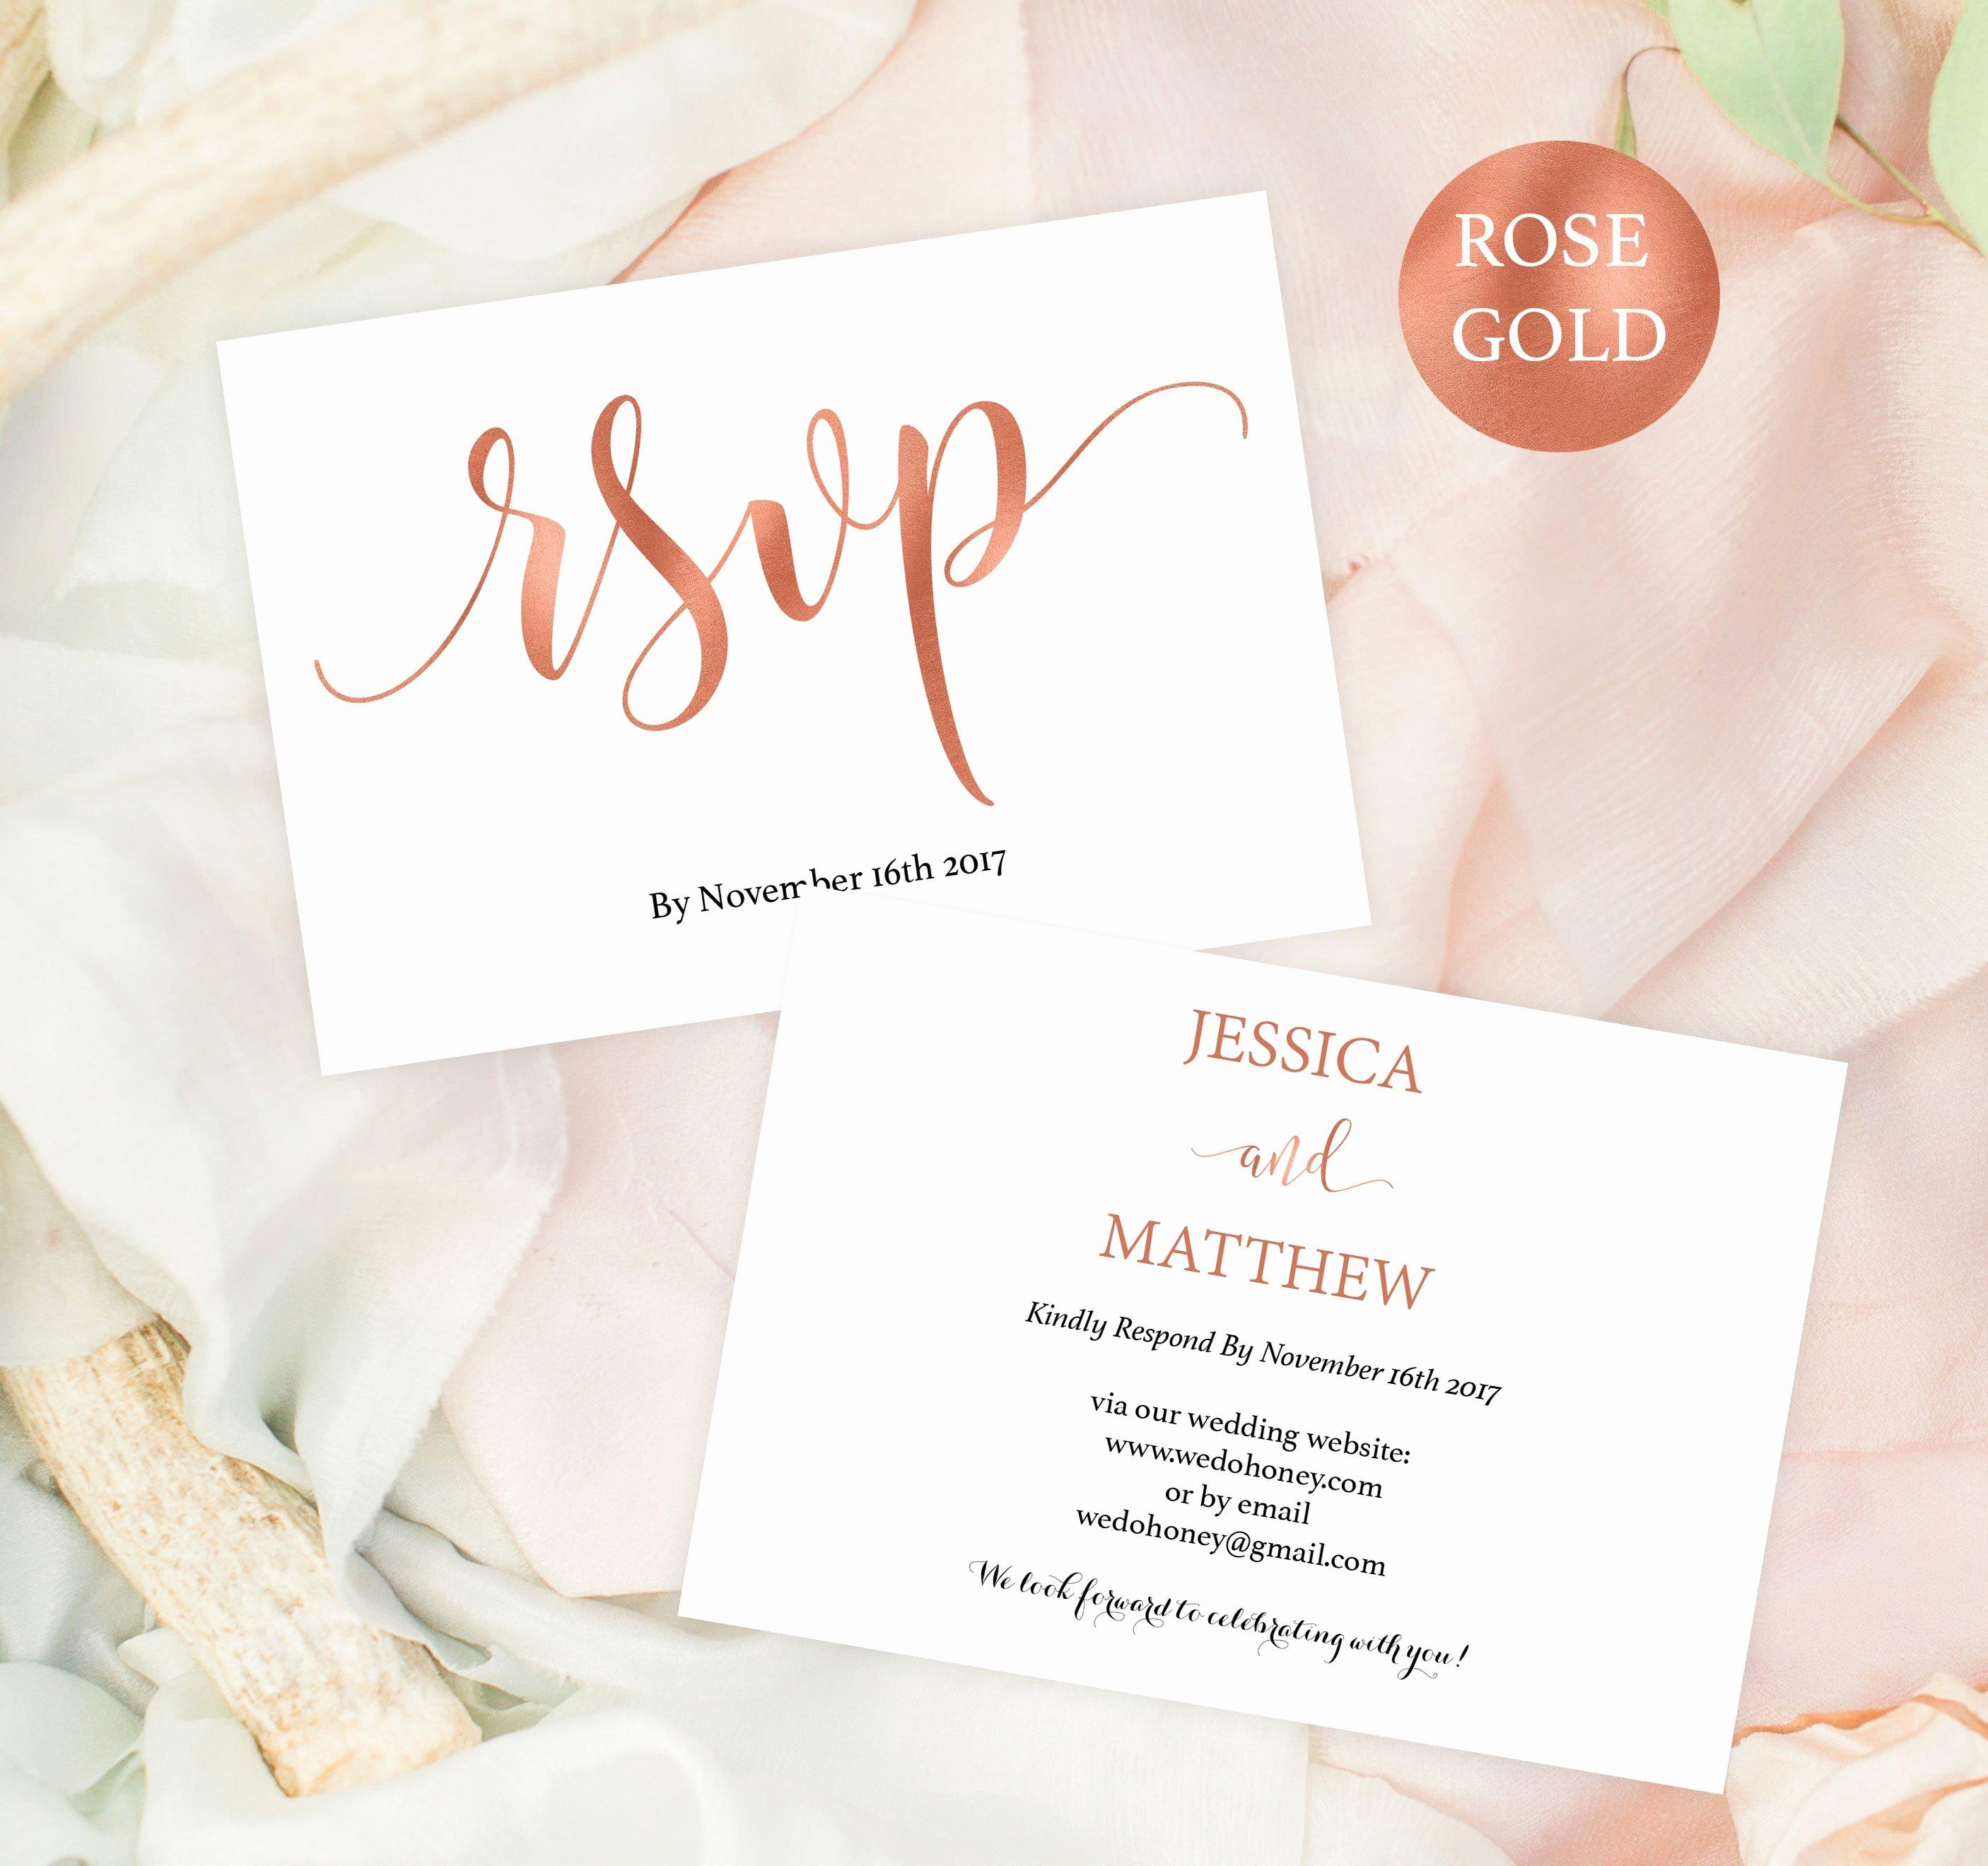 Wedding Rsvp Postcards Template Best Of Wedding Rsvp Postcard Rsvp Template Rsvp Online Rose